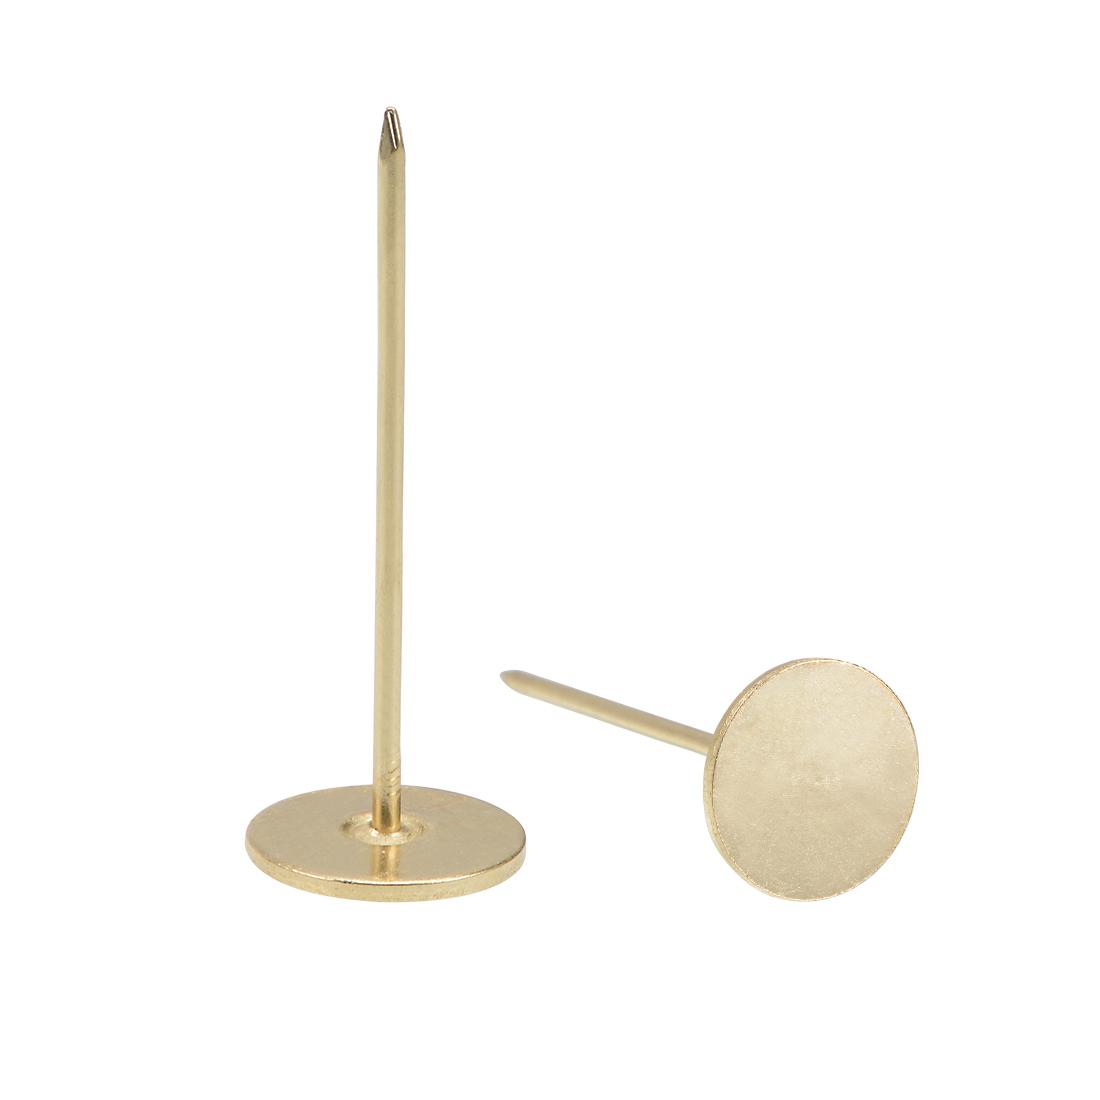 Upholstery Nails Tacks 18mmx50mm Flat Head Furniture Nails Gold Tone 40 Pcs